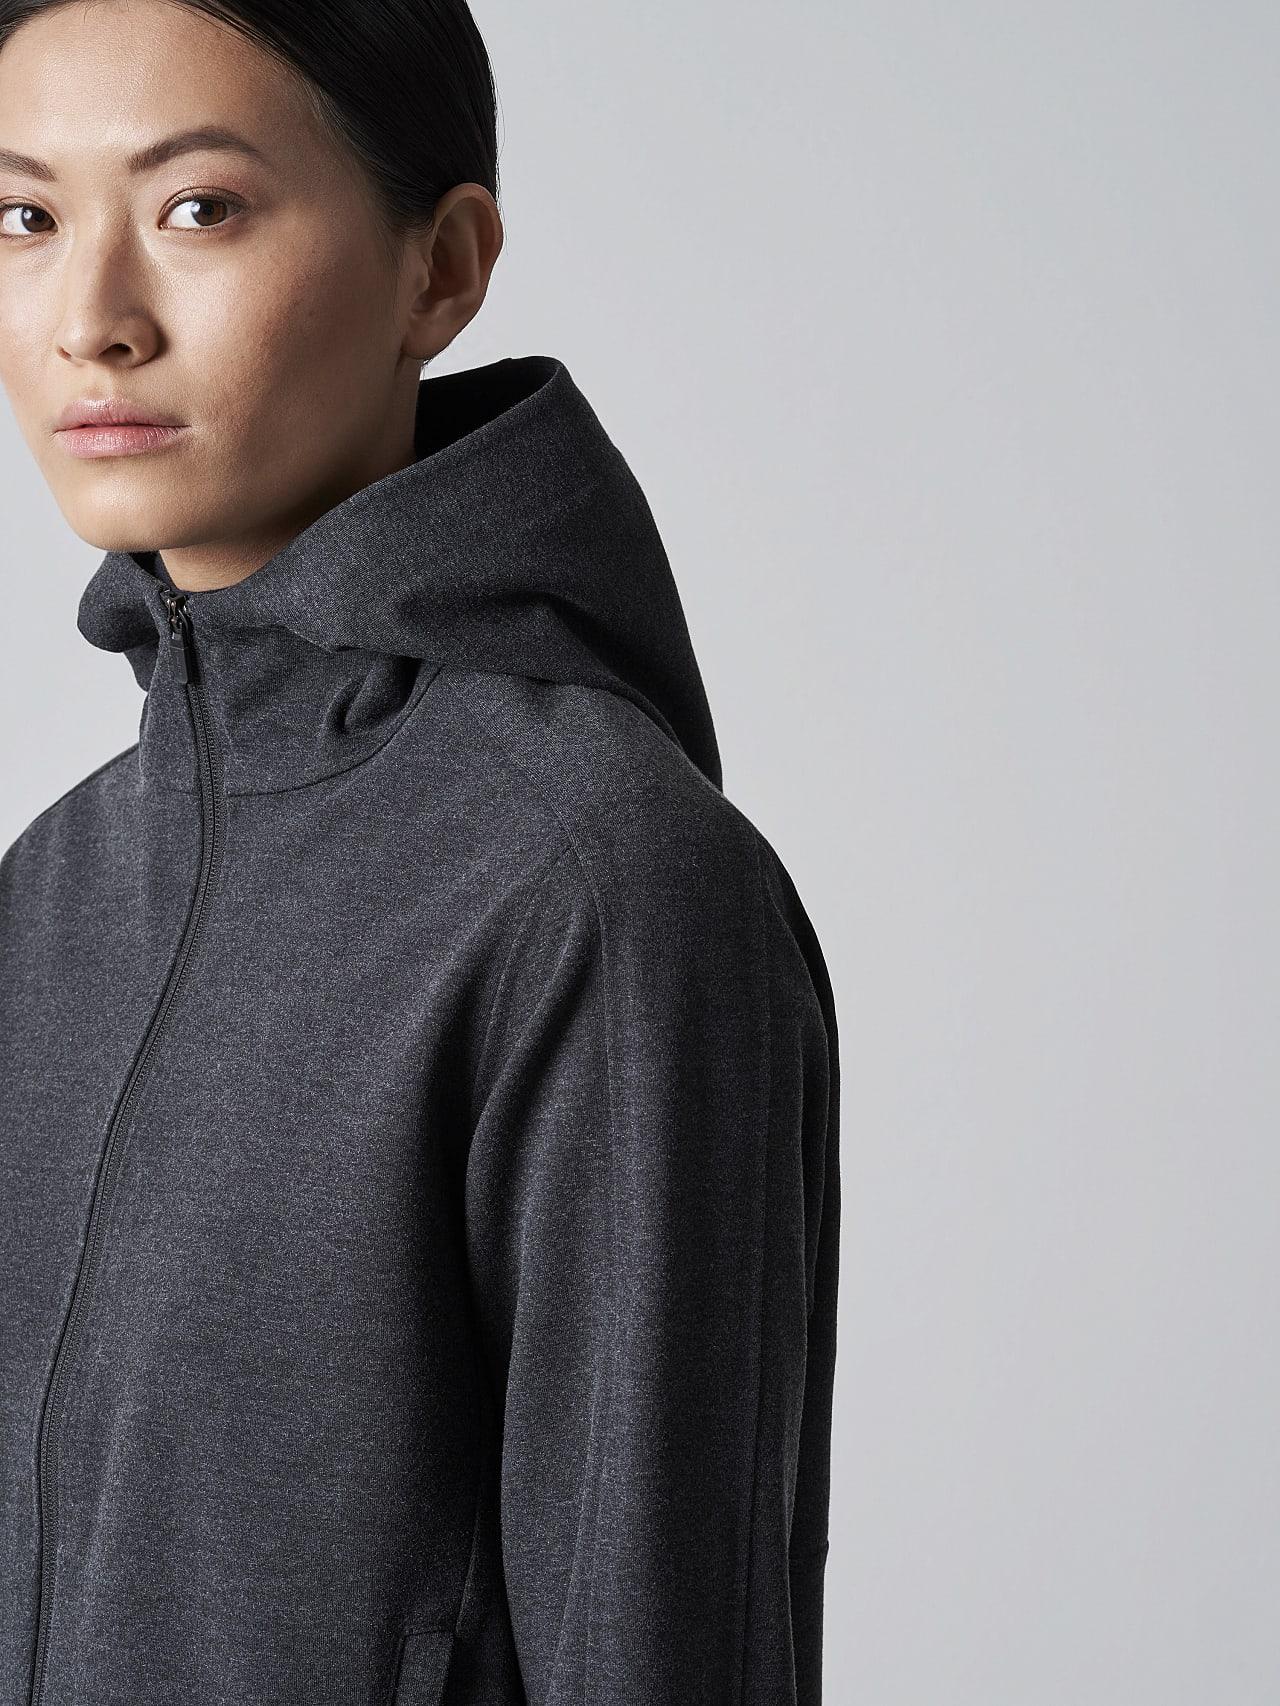 SINNO V2.Y5.02 Waterproof Hooded Jacket dark grey / anthracite Right Alpha Tauri